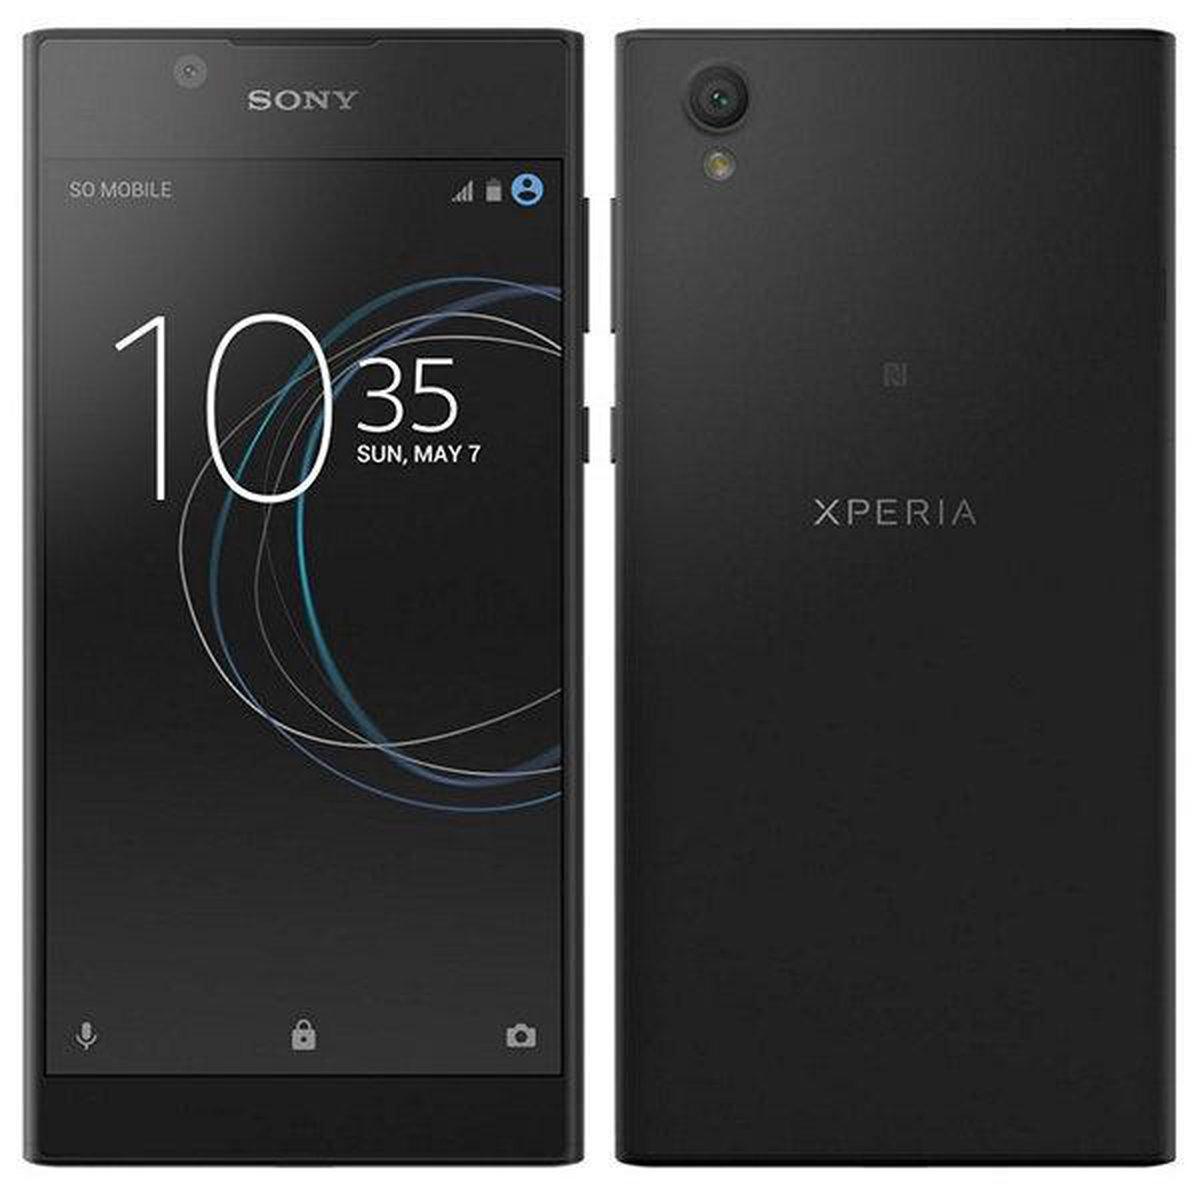 "SMARTPHONE SONY L1 5,5"" IPS LCD QUAD CORE 16 GB kopen"